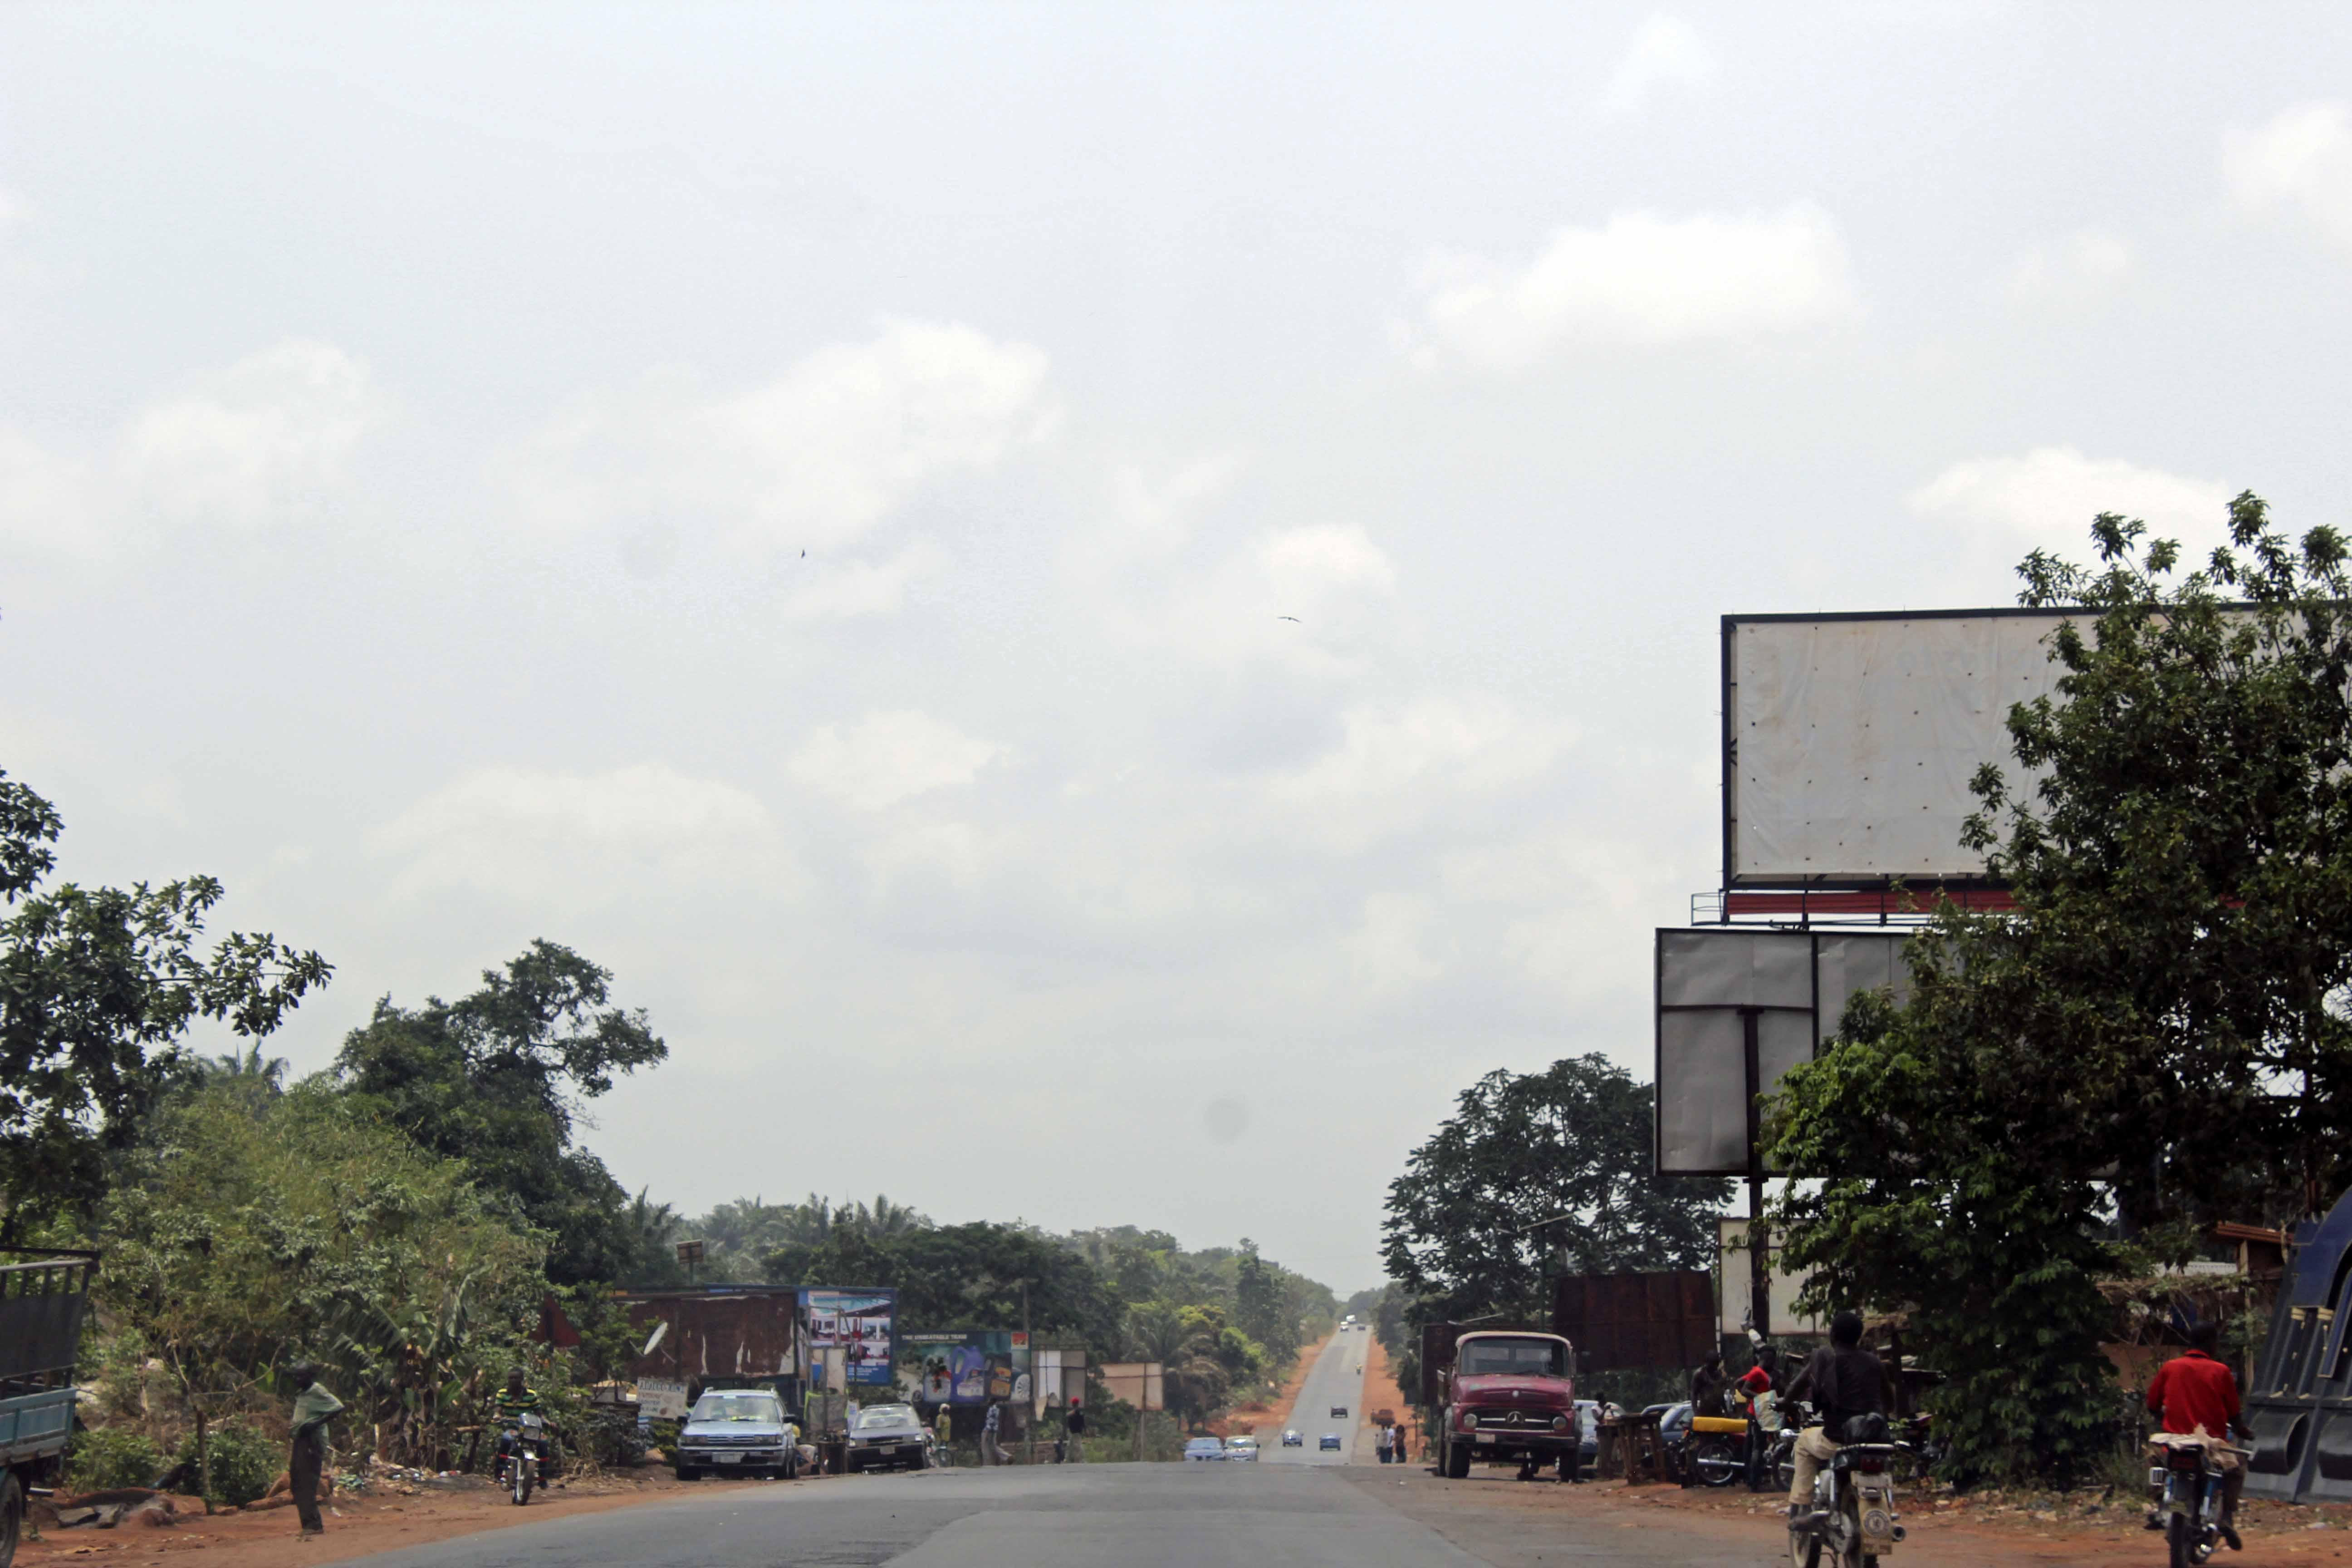 Nsukka Enugu State Nigeria